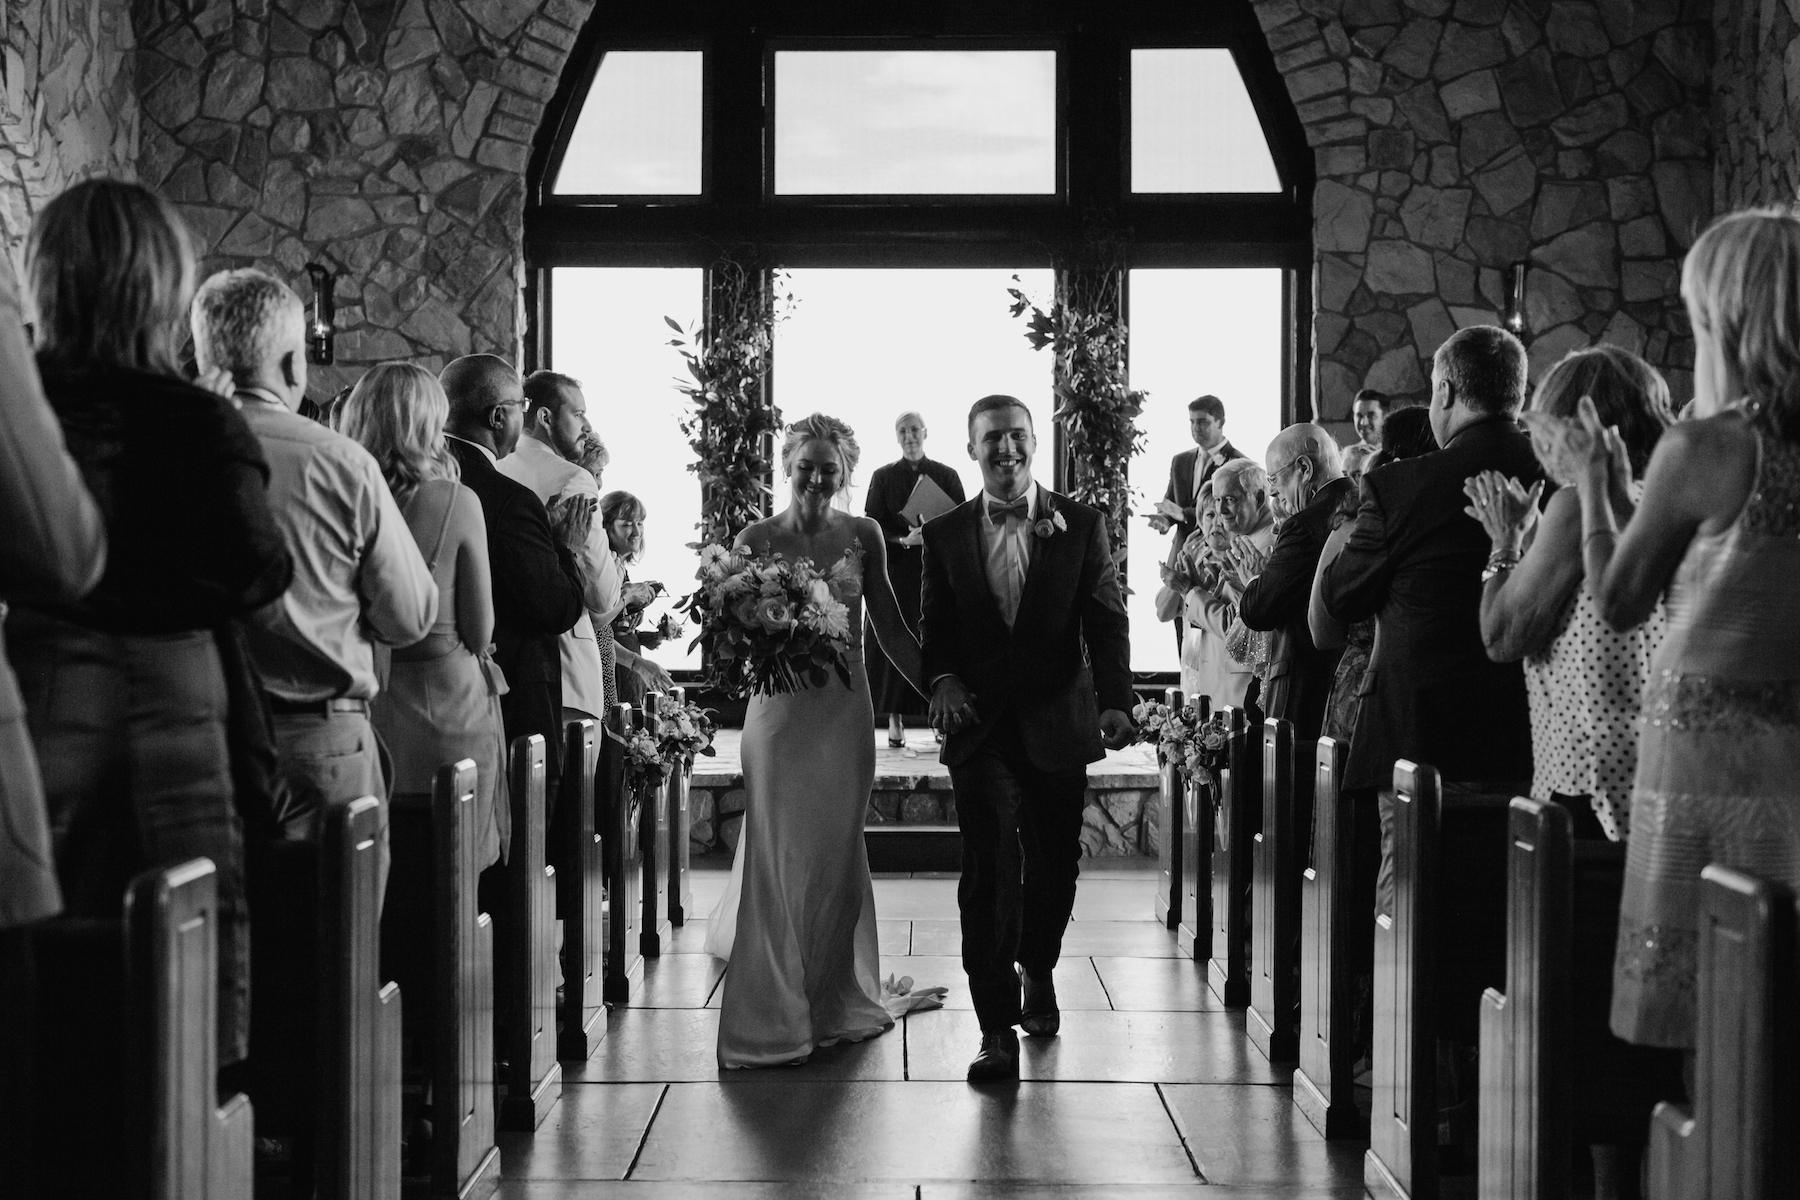 wedding-engagement-photographer-spartanburg-greenville-columbia-carolina-south-north-499.JPG